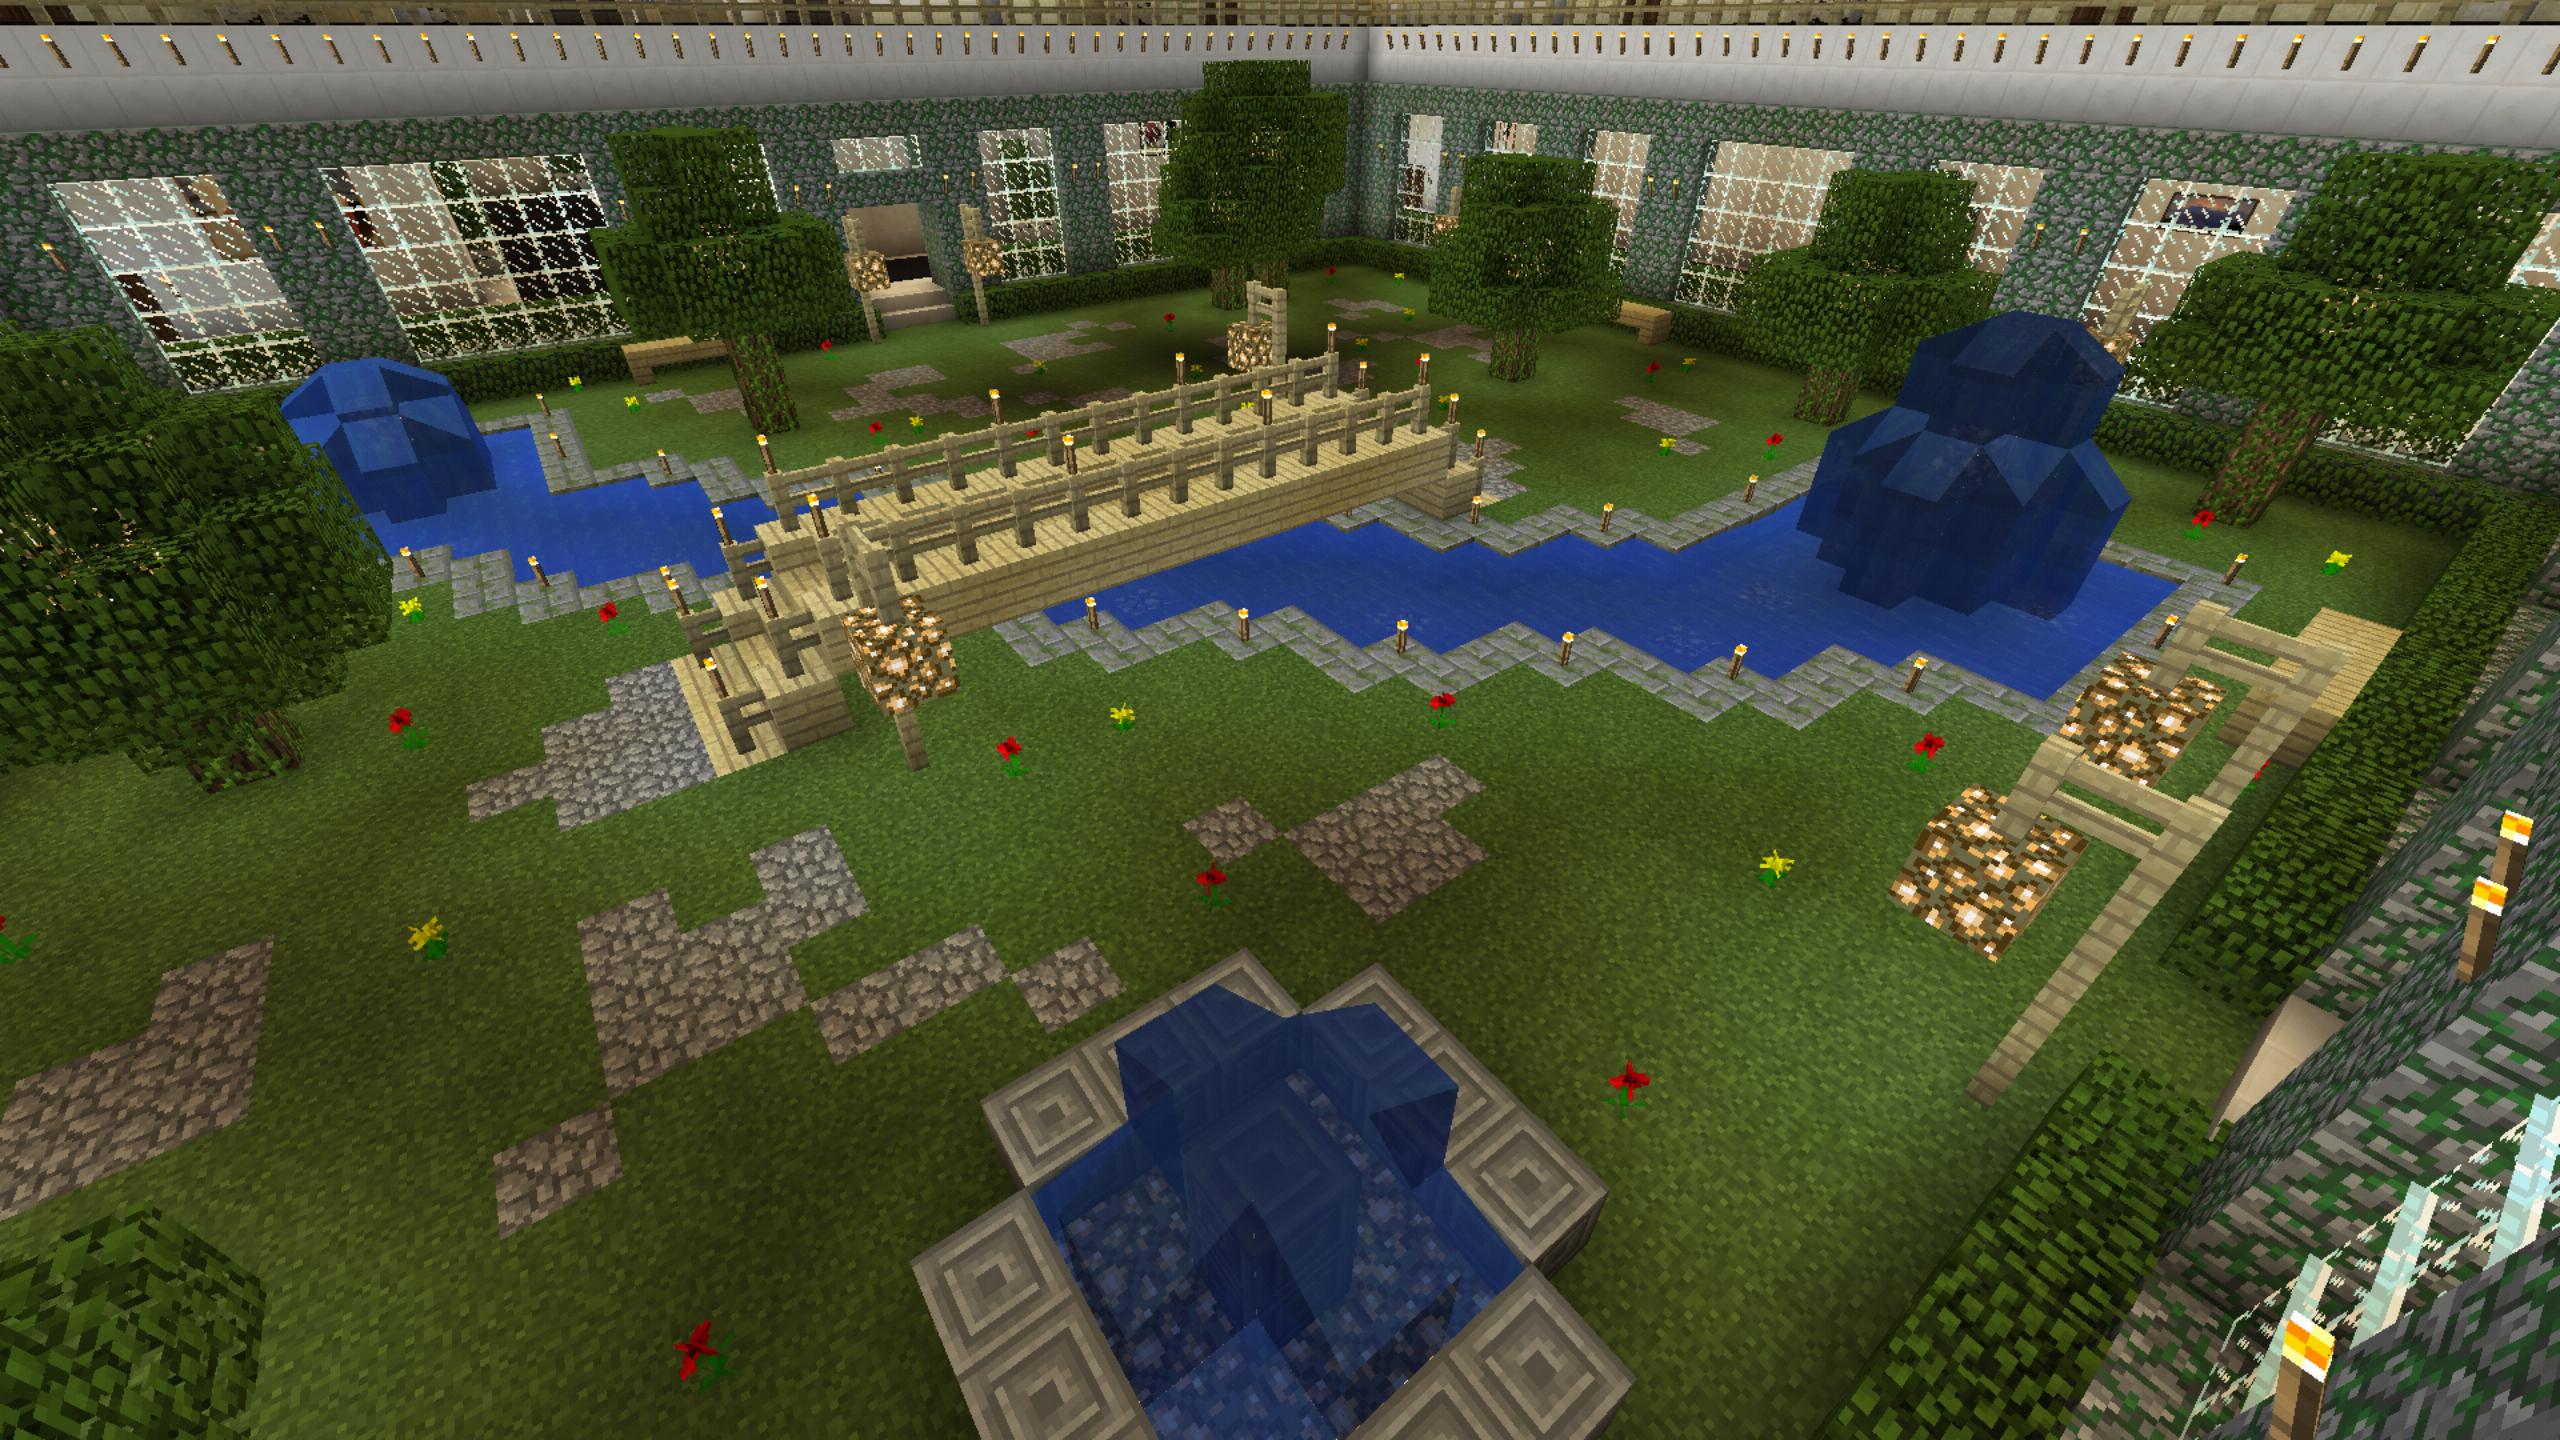 Minecraft Garden River Flowers Bridge Pond Water Fountain Fall